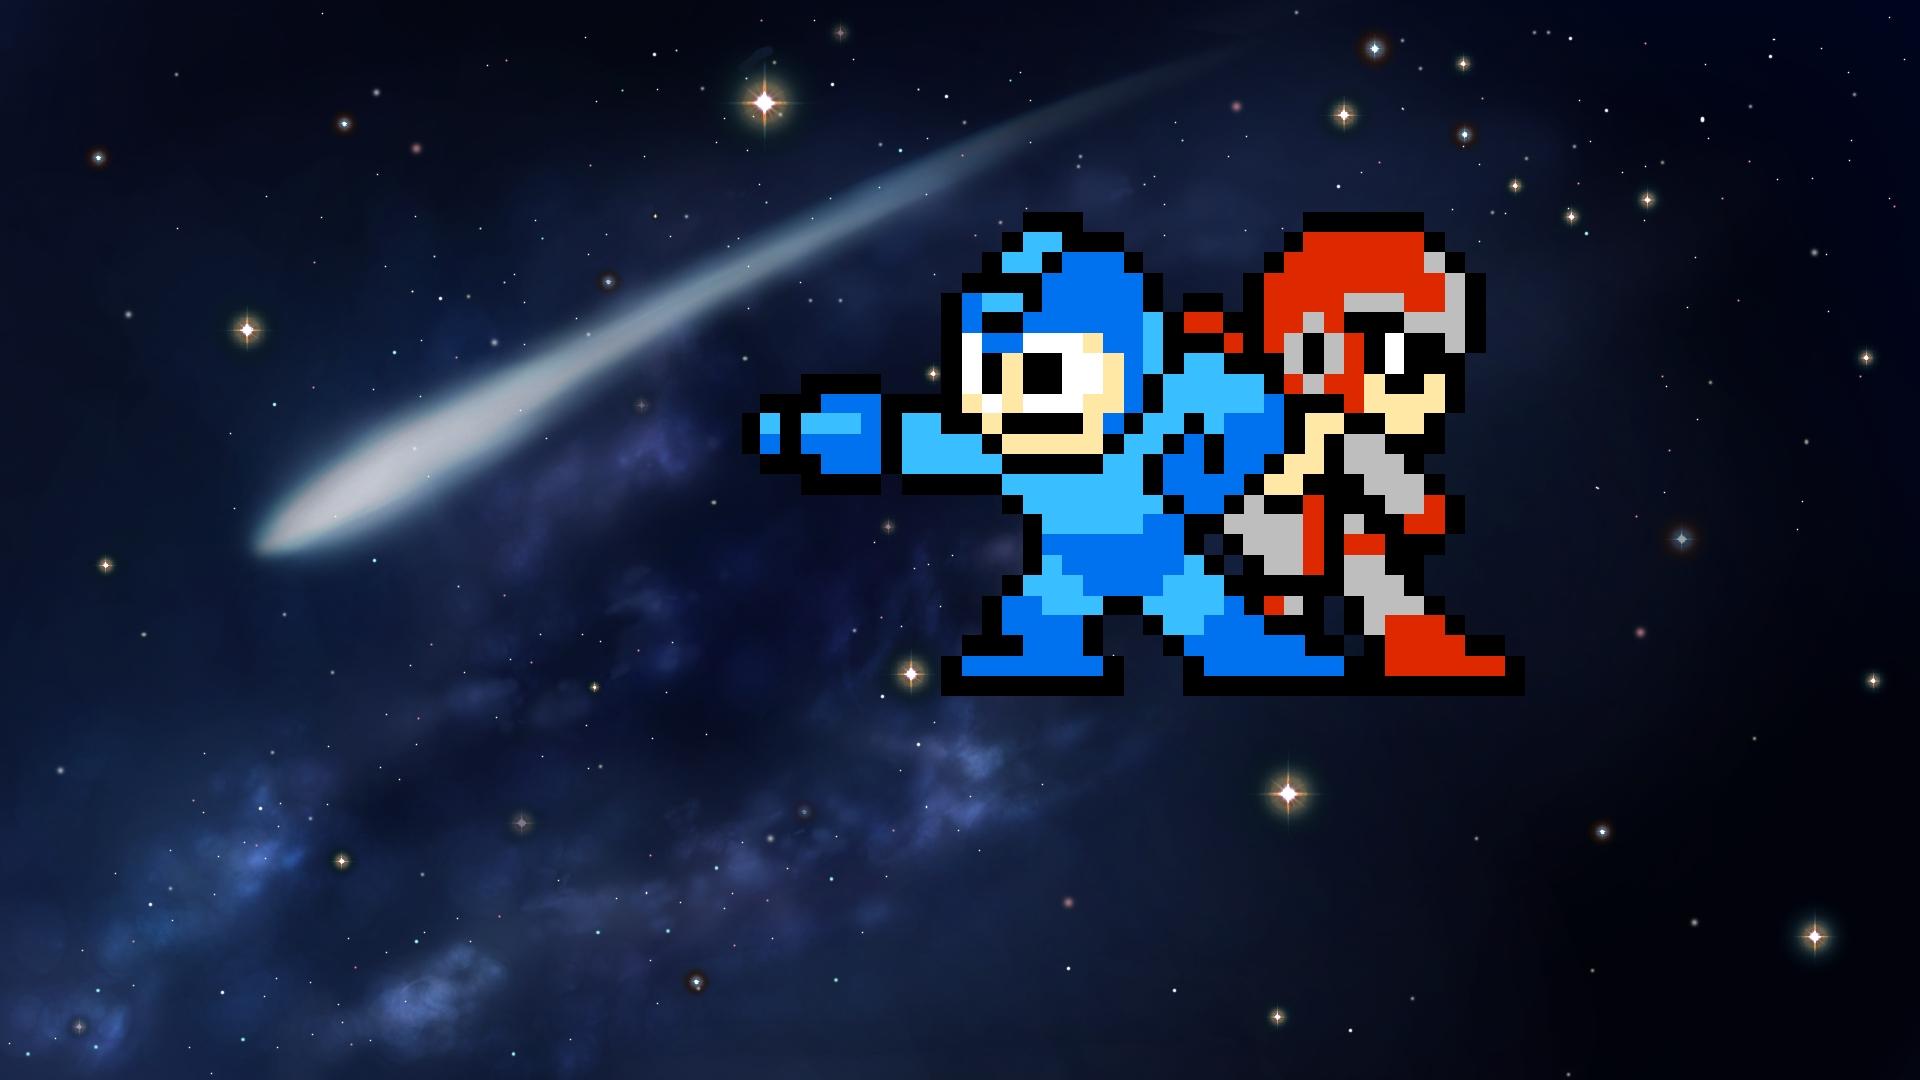 Video Game Mega Man 2 Wallpaper Resolution 1920x1080 Id 596330 Wallha Com